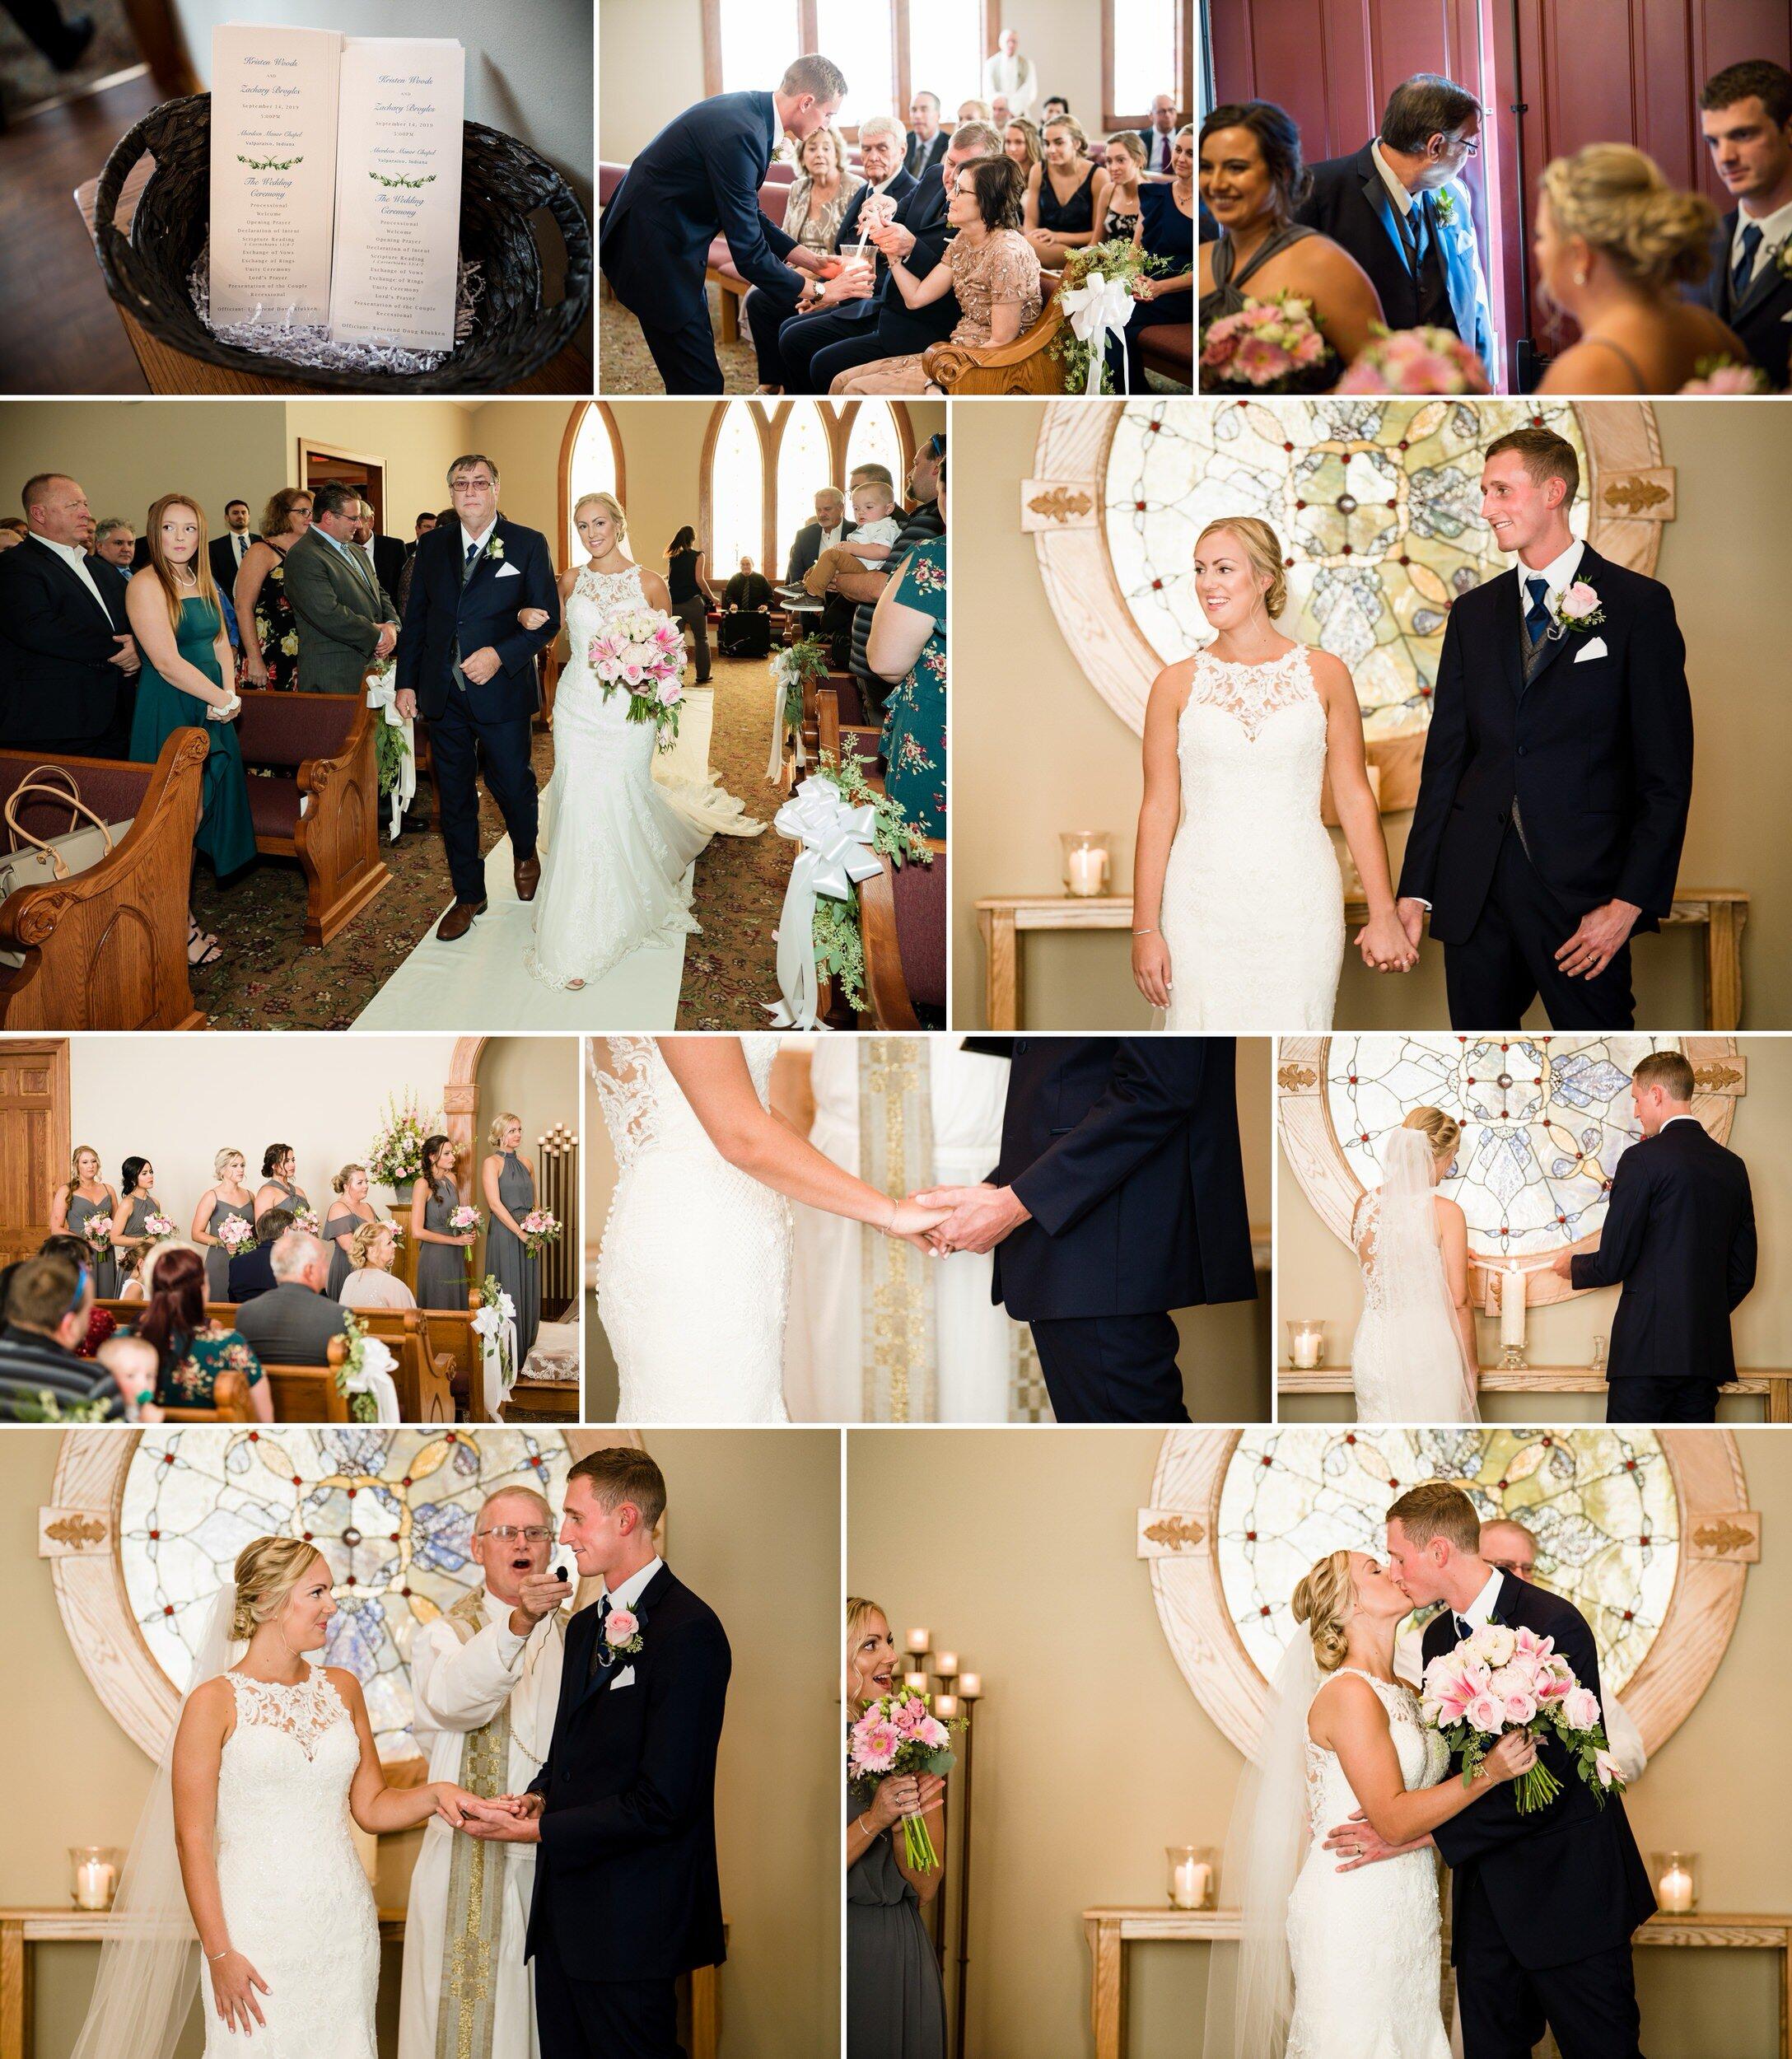 A September wedding ceremony at Aberdeen Chapel.